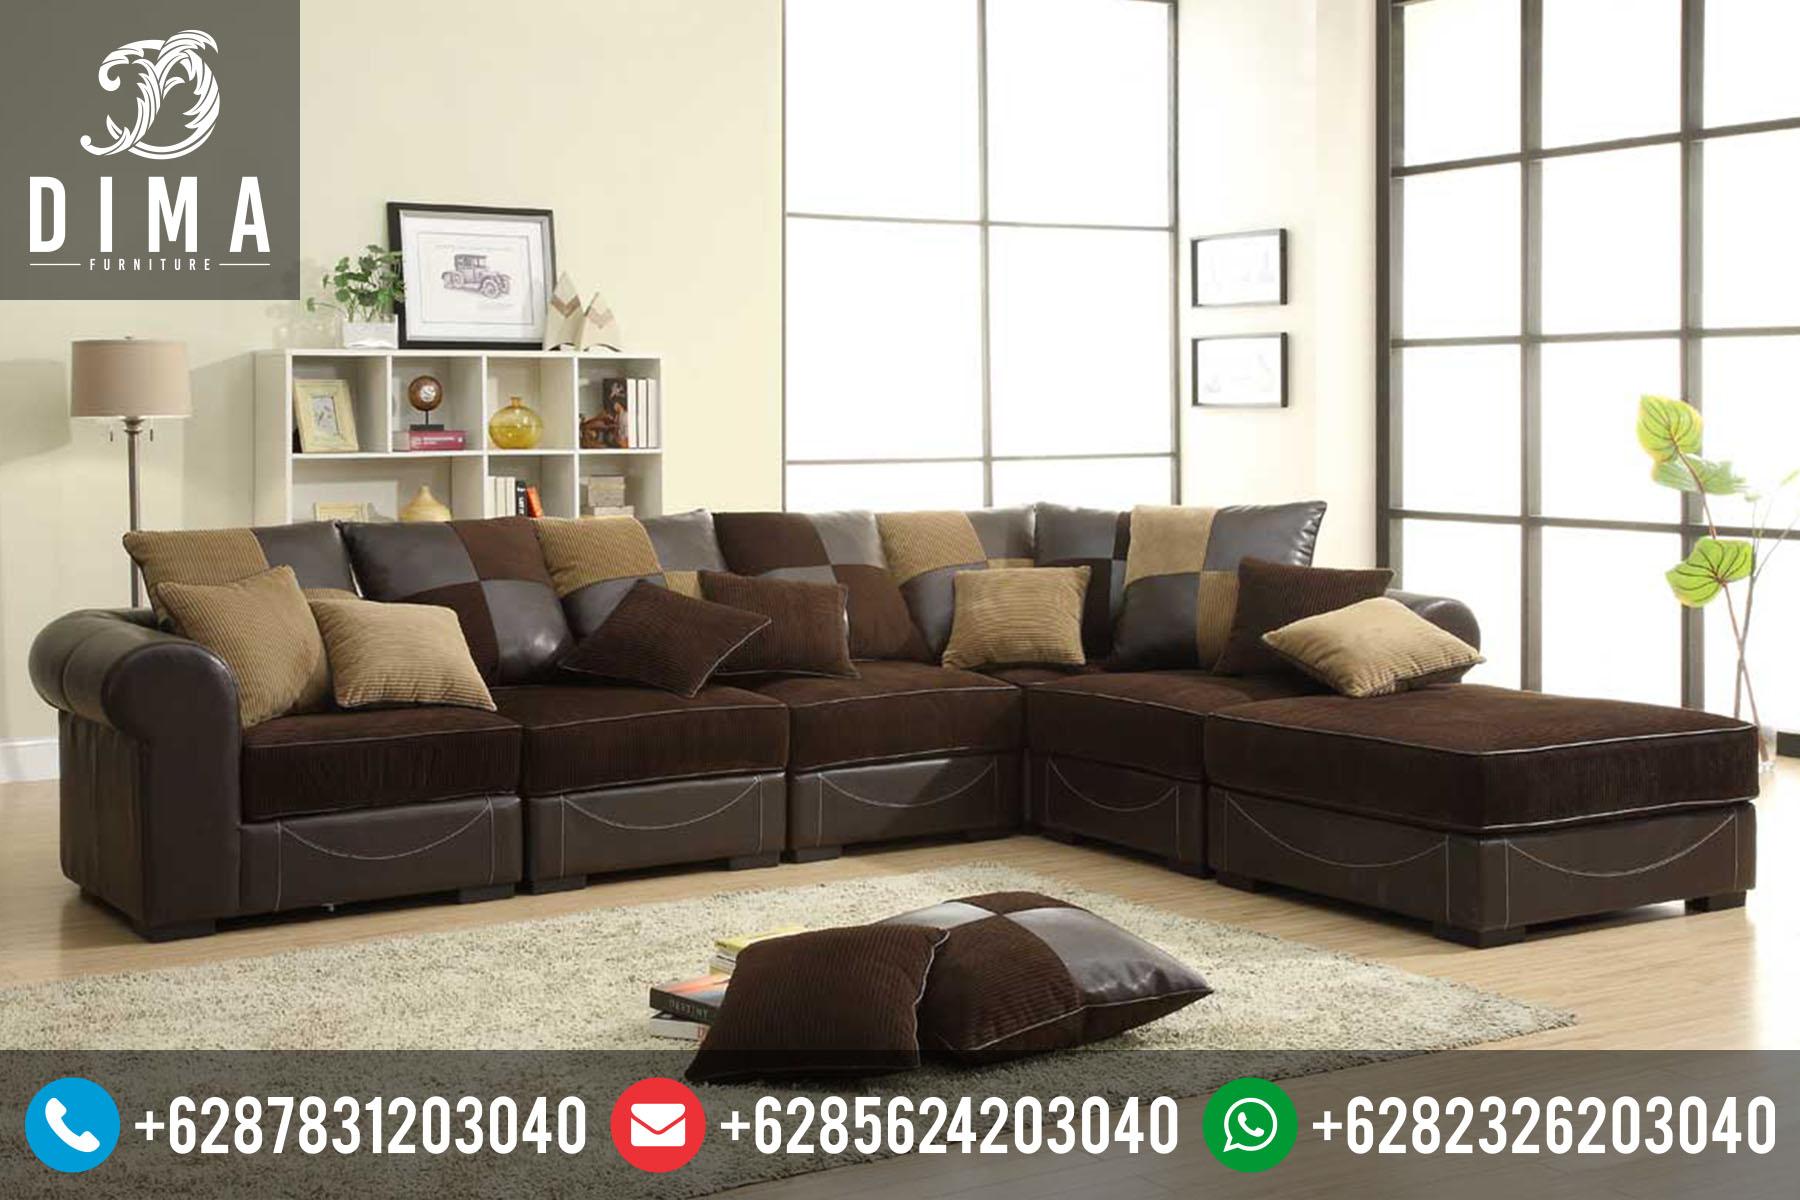 Set Sofa Tamu Sudut L Minimalis Modern Terbaru Murah ST-0018